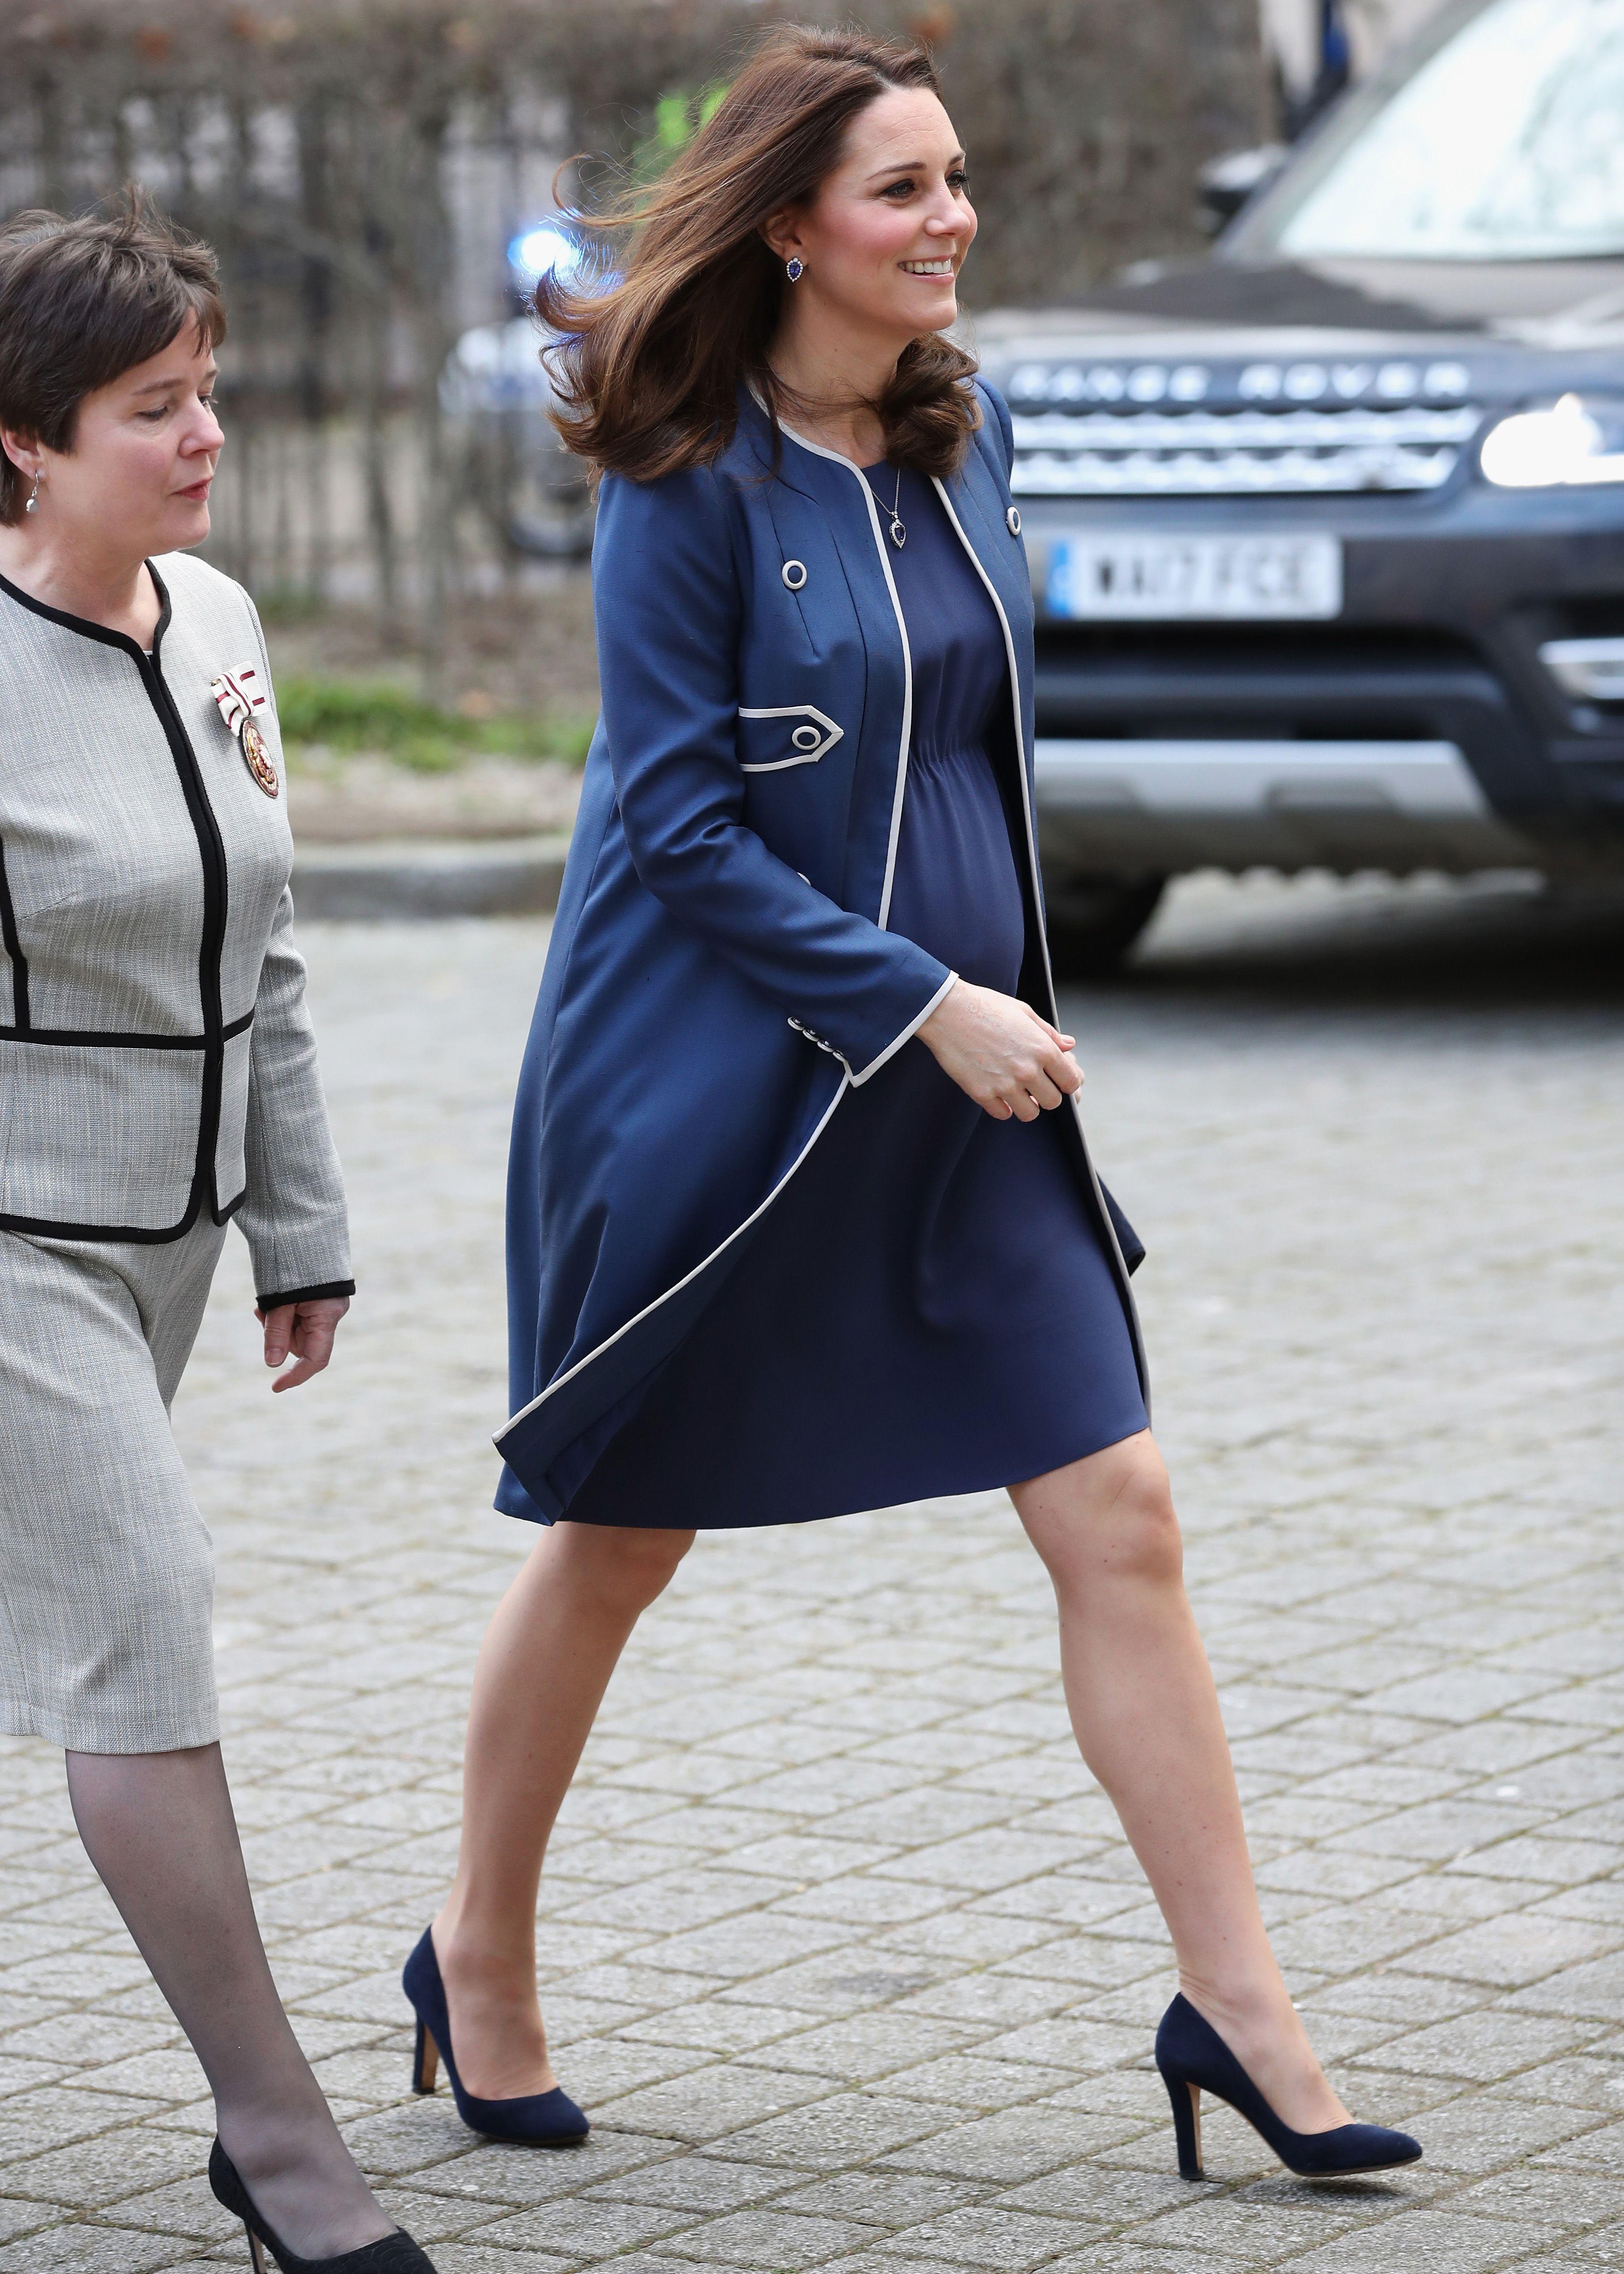 d624a54cbfc 50 Best Kate Middleton Pregnant Style Looks - Princess Kate Maternity  Fashion